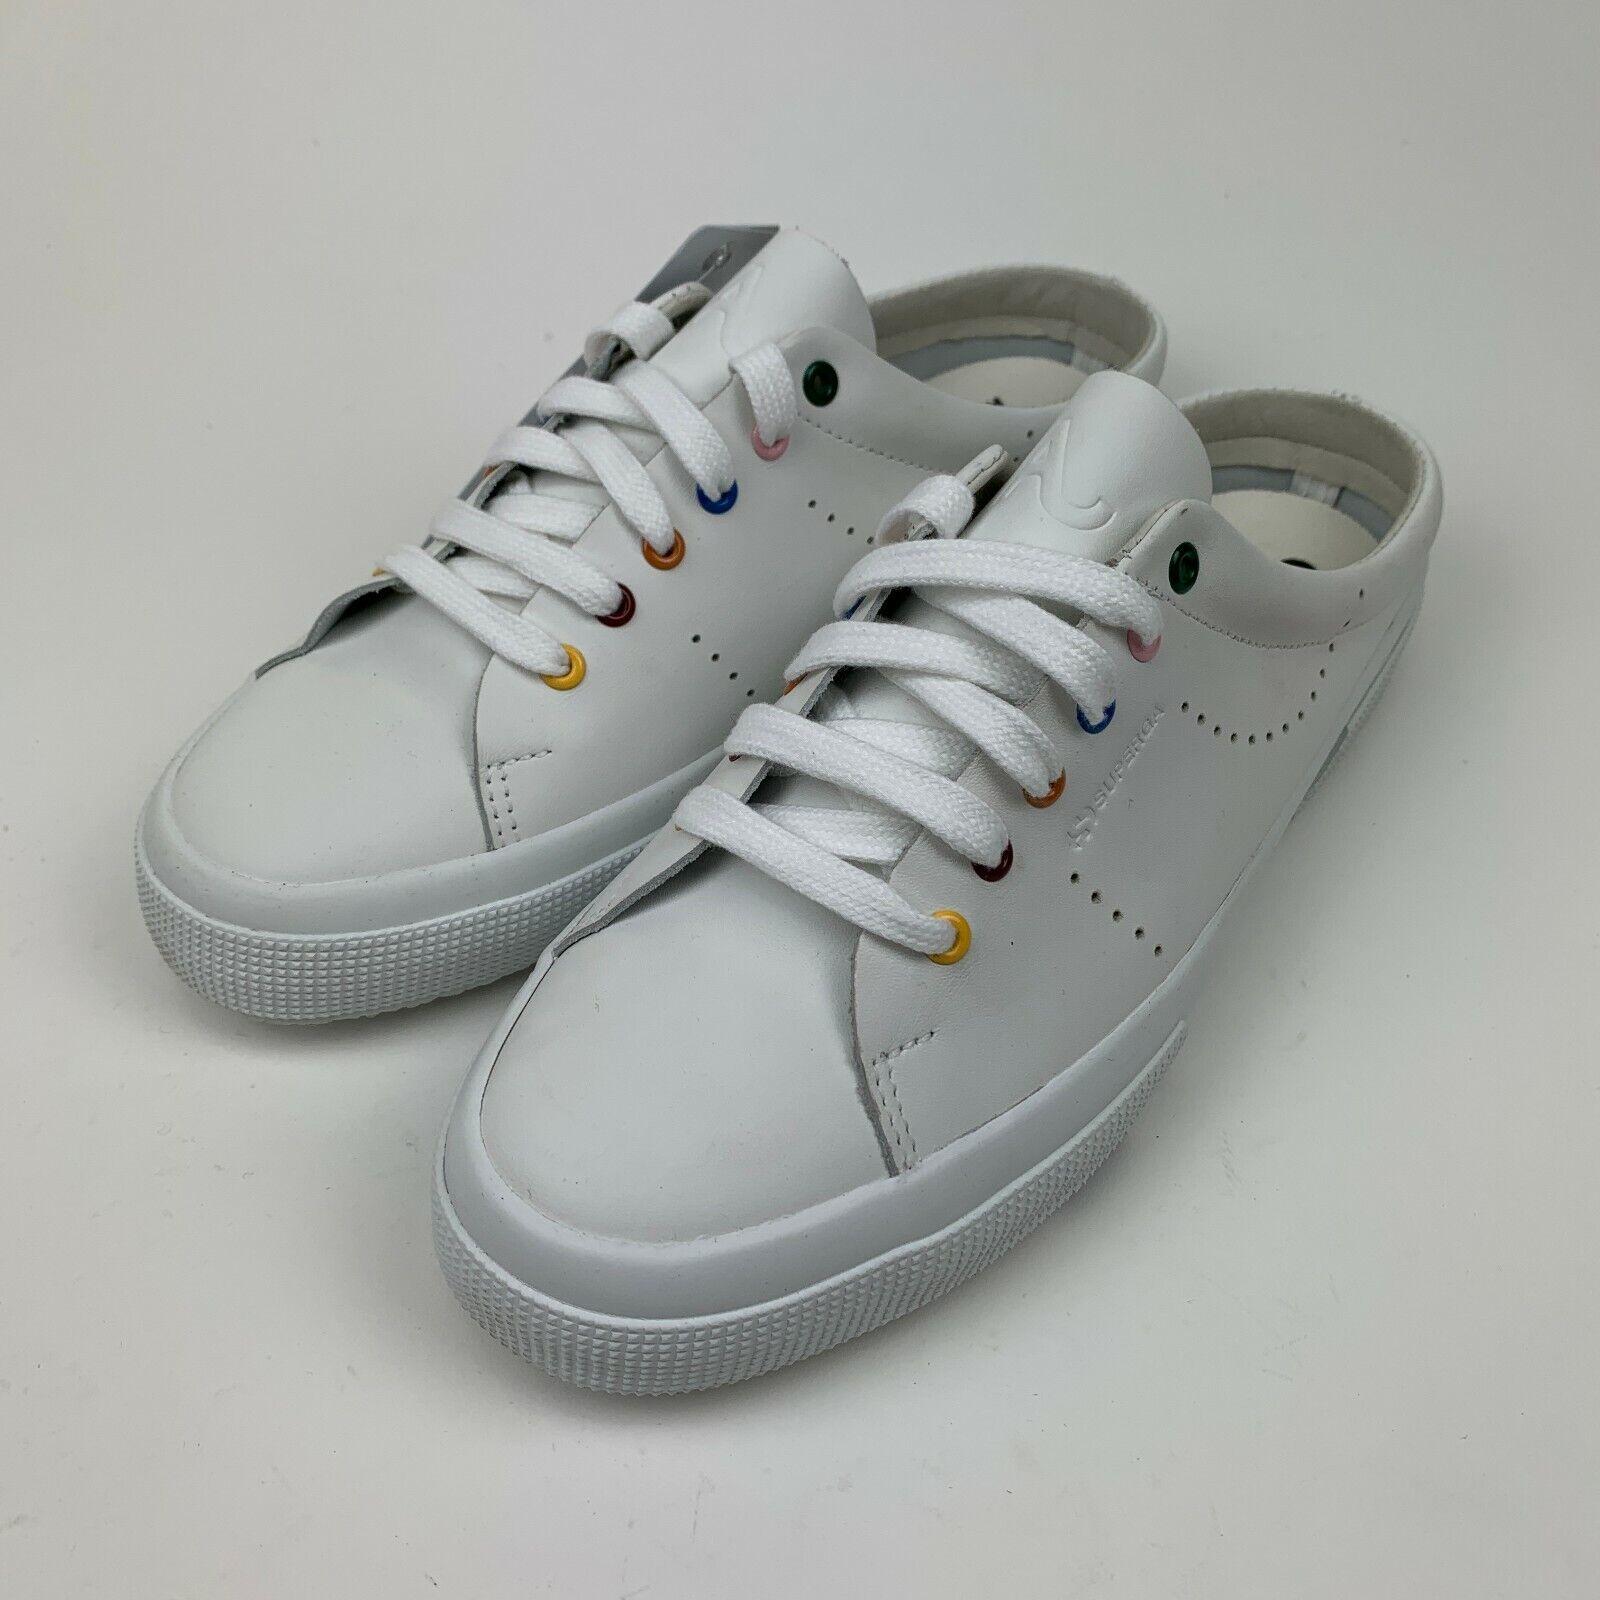 NIB SUPERGA 2402 Alexa Chung Womens White Rainbow Leather Casual Sneaker Shoes